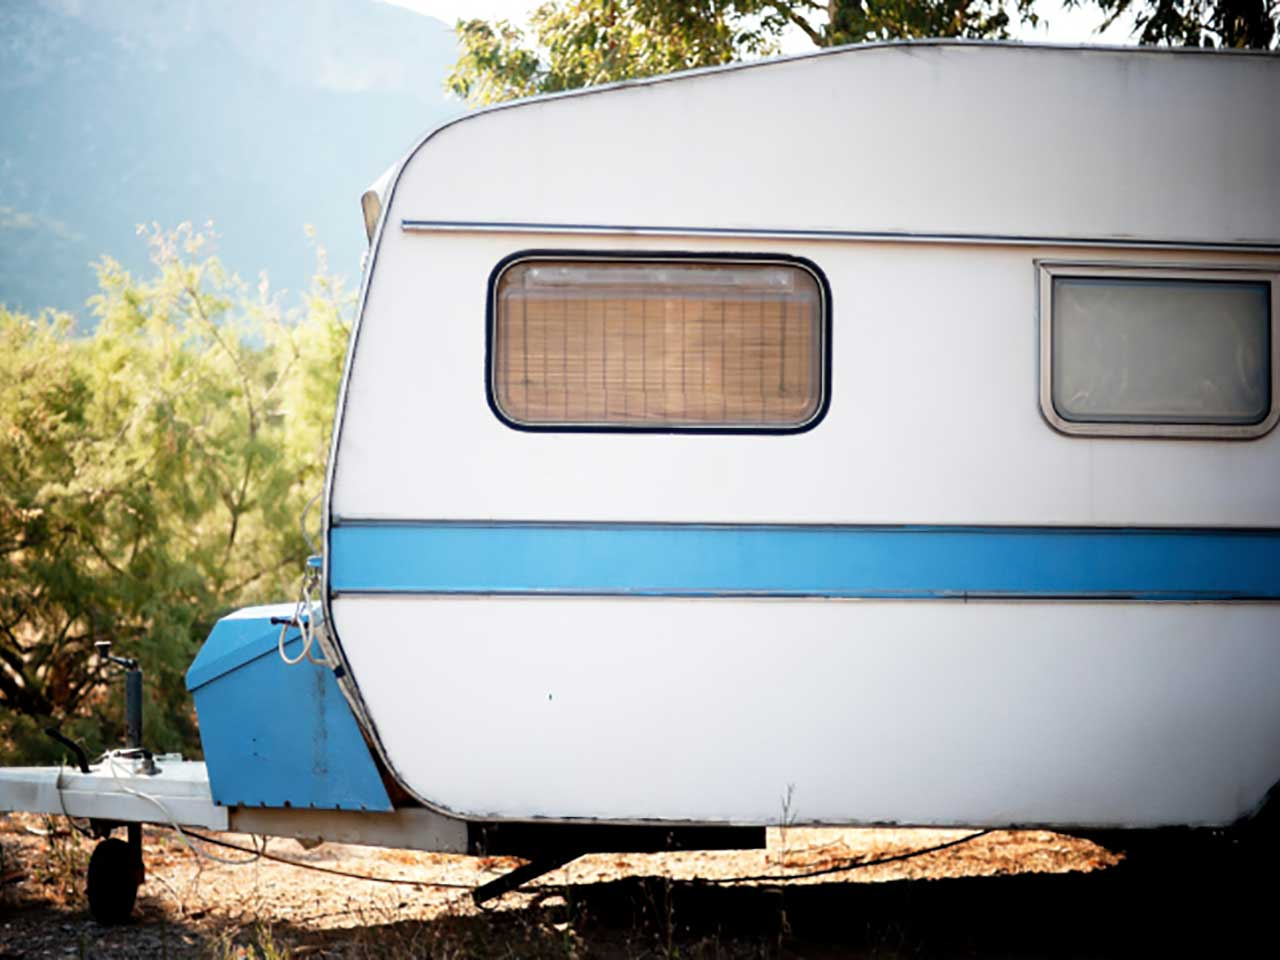 How to prevent damp in caravans - Saga